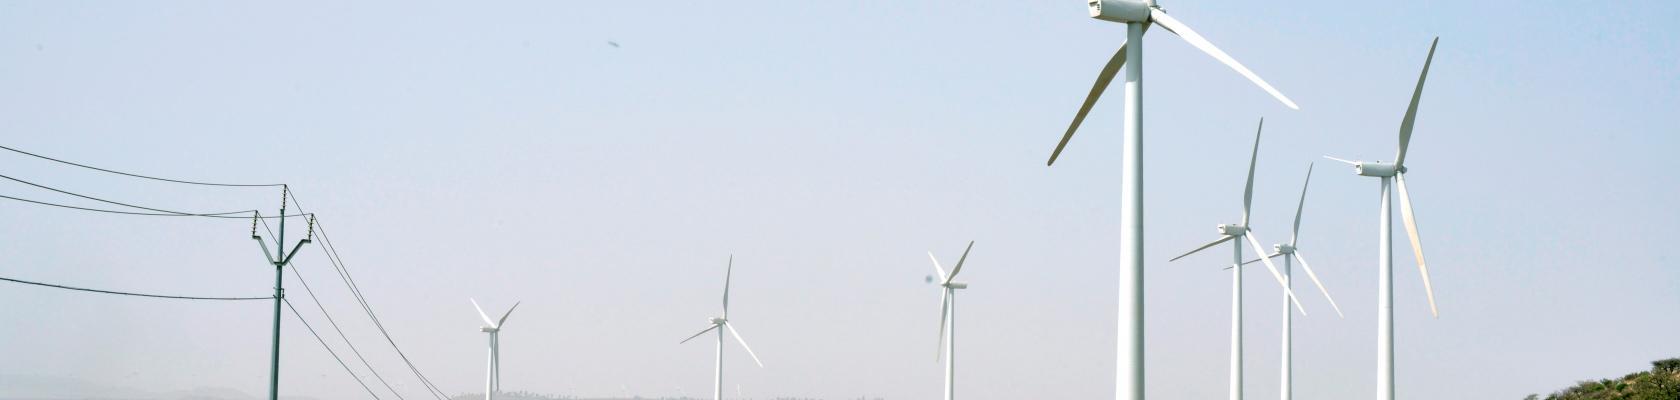 Ashegoda windfarm, Ethiopia